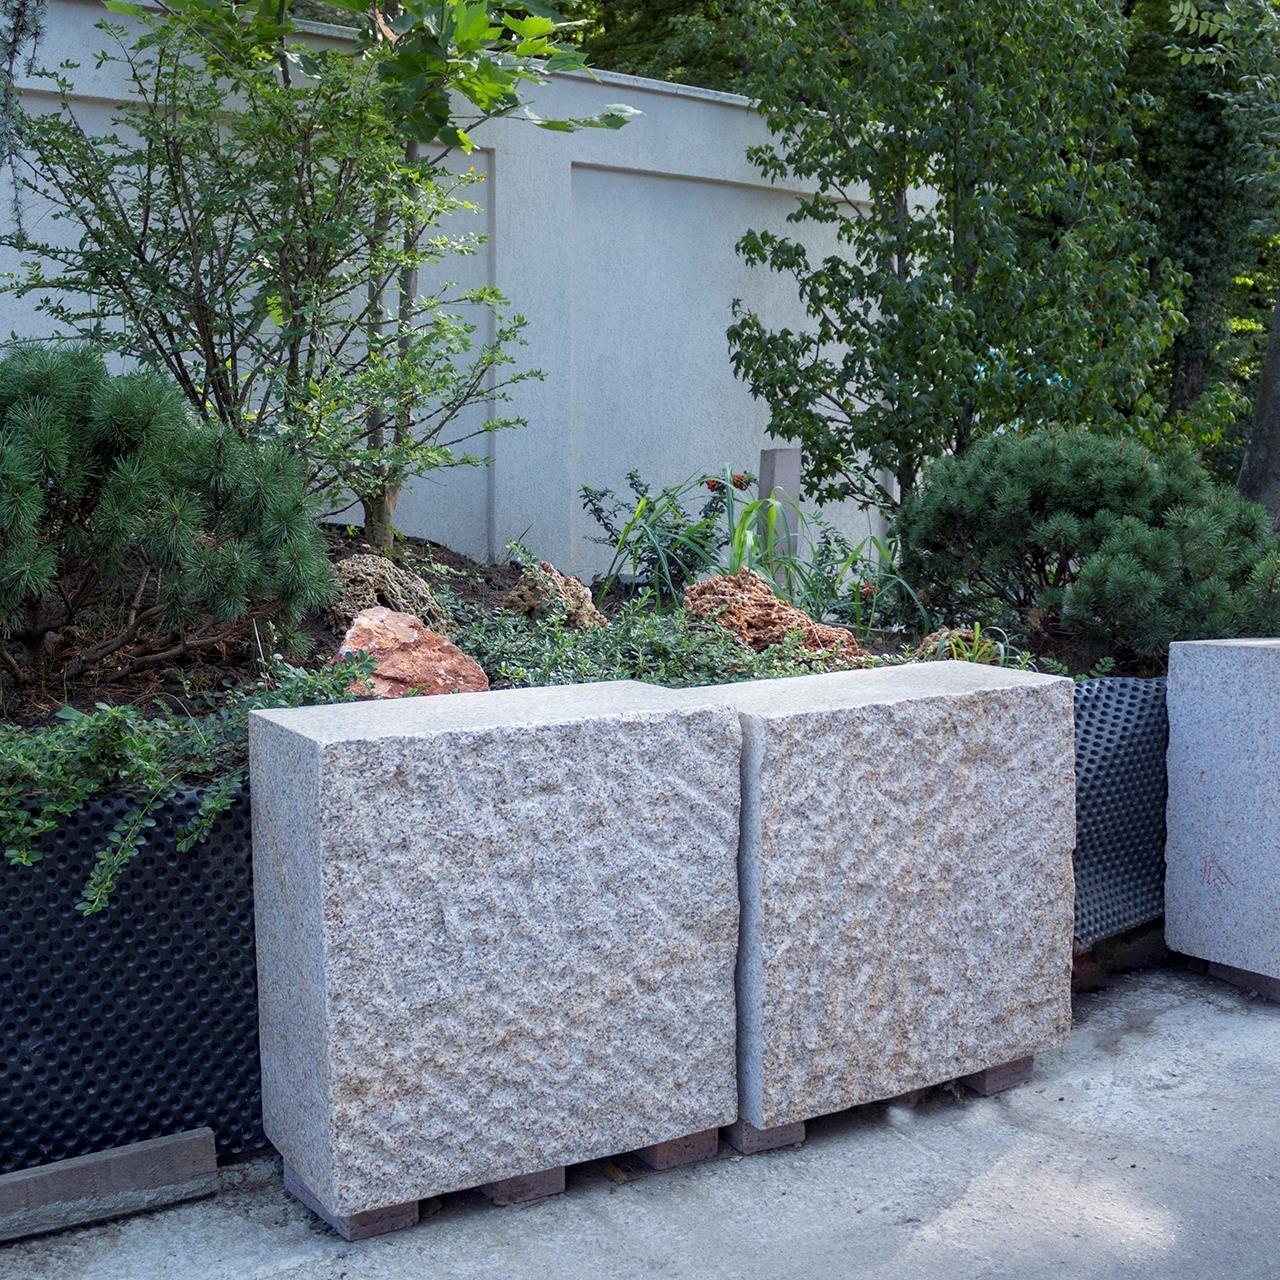 Padang Yellow Granite Garden Bench (60 x 60 x 30 cm)